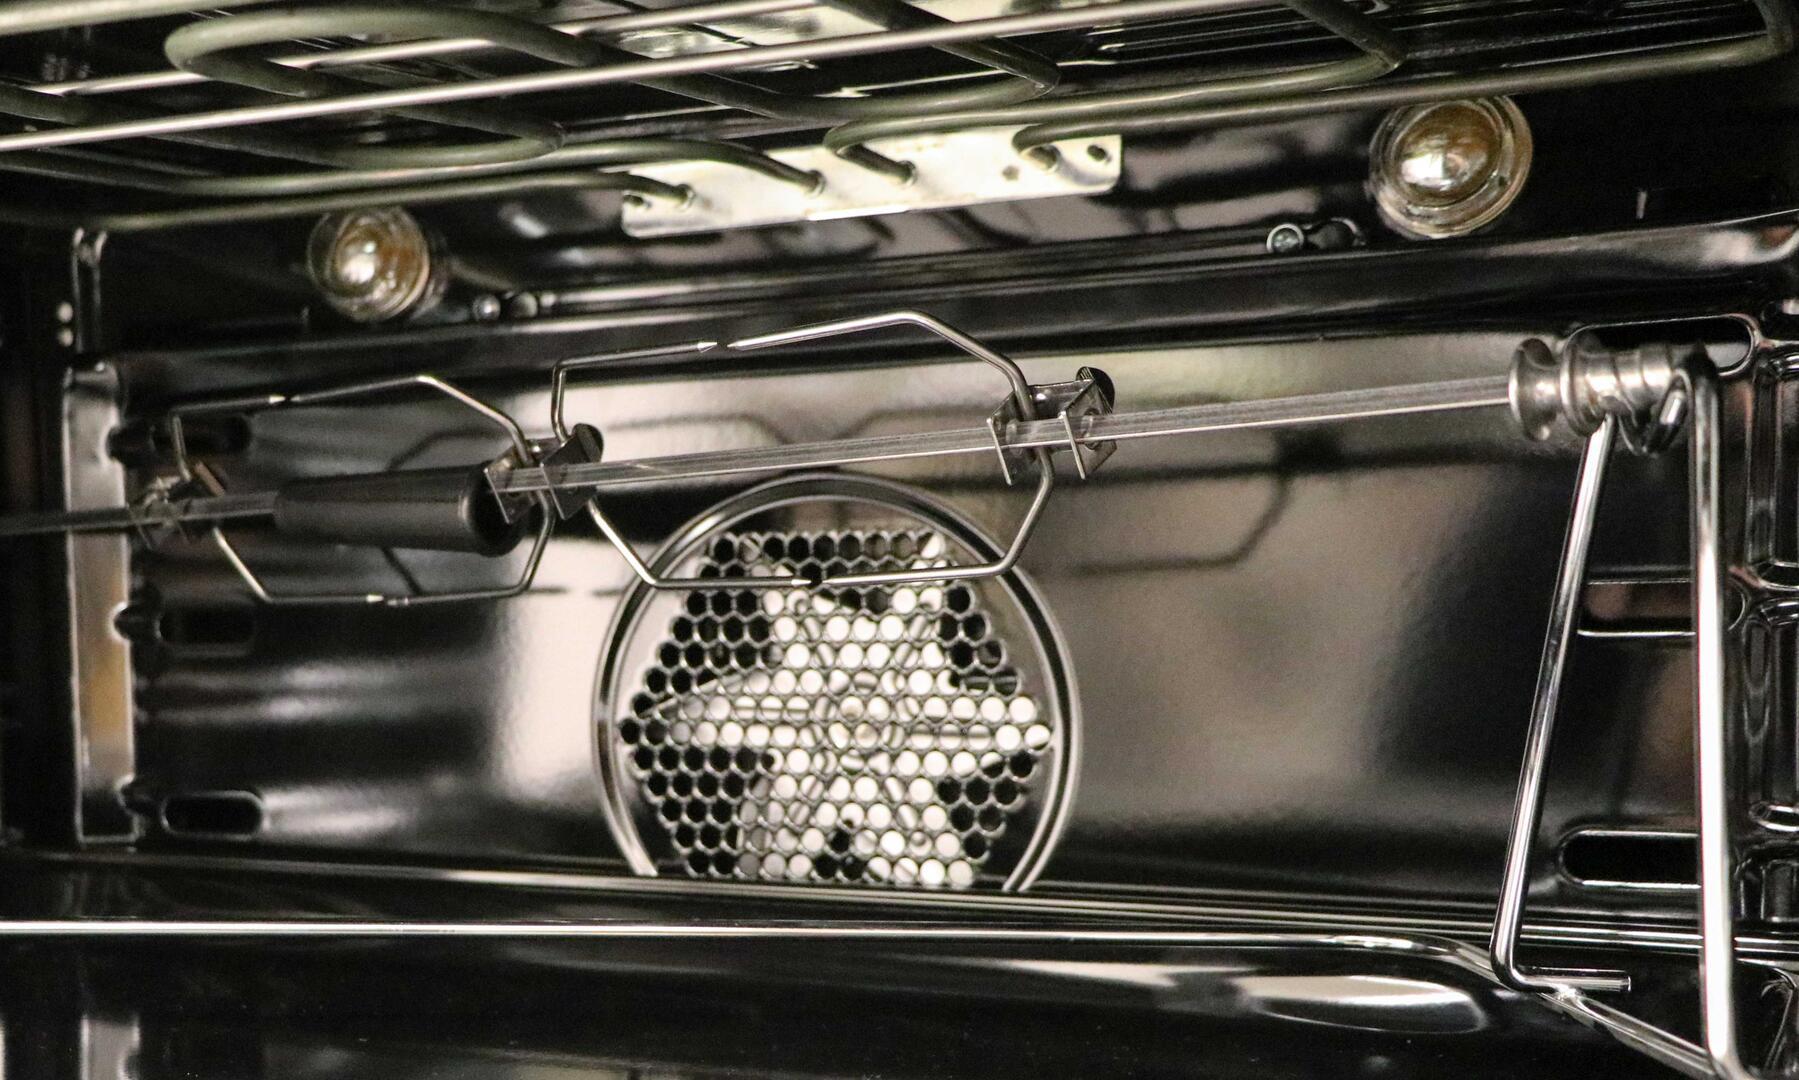 Ilve Nostalgie UPDN100FDMPVSLP Freestanding Dual Fuel Range Green, Main Oven Rotisserie